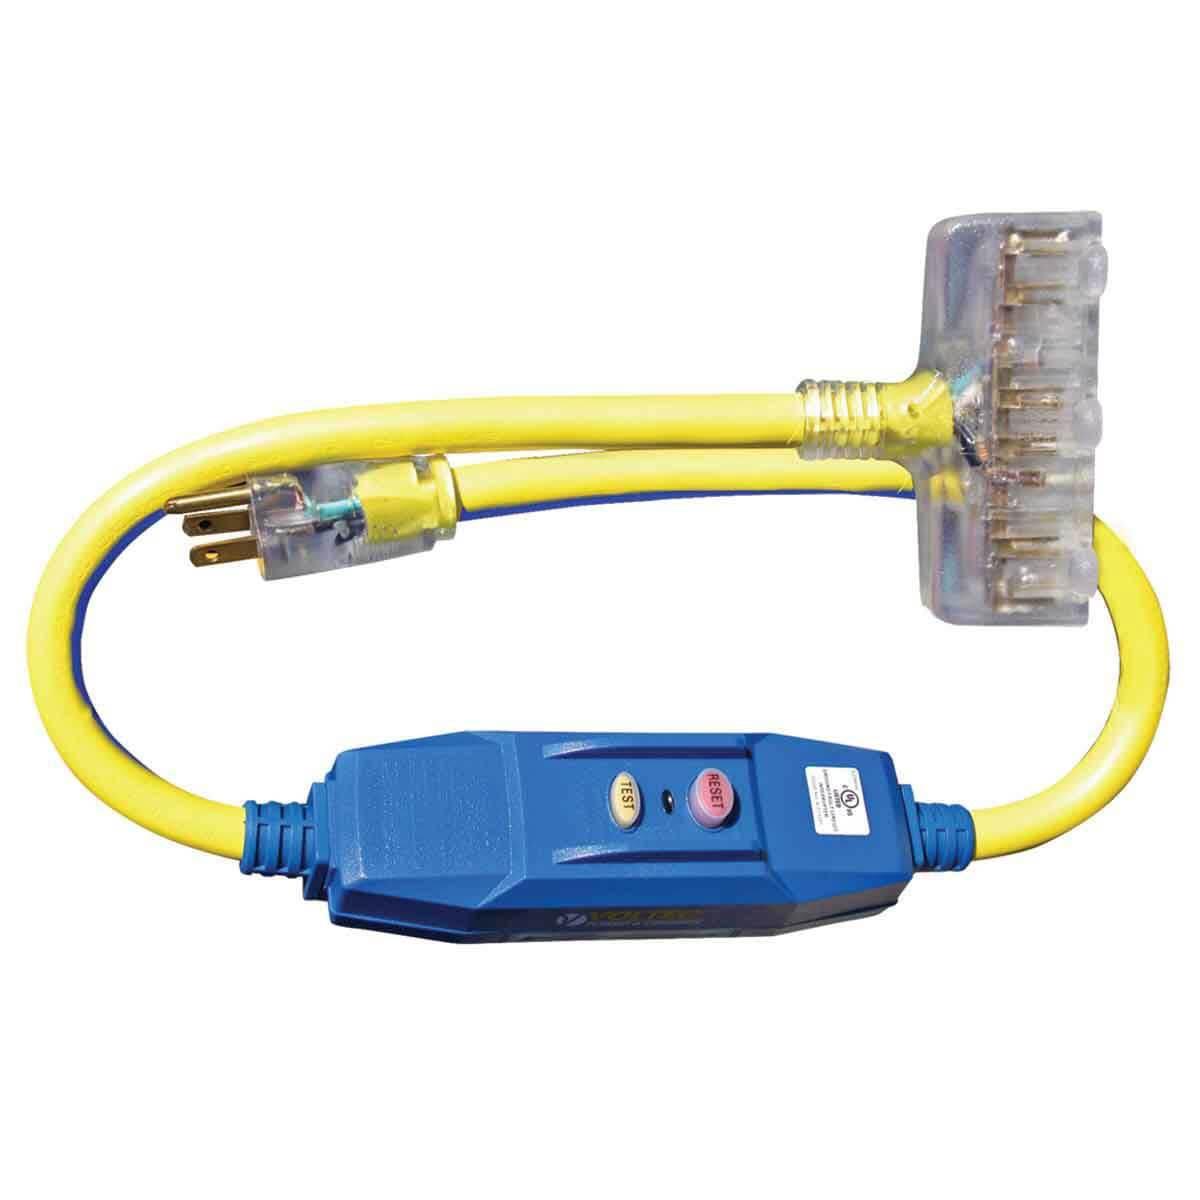 Voltec 12/3 20 Amp GFCI Power cord